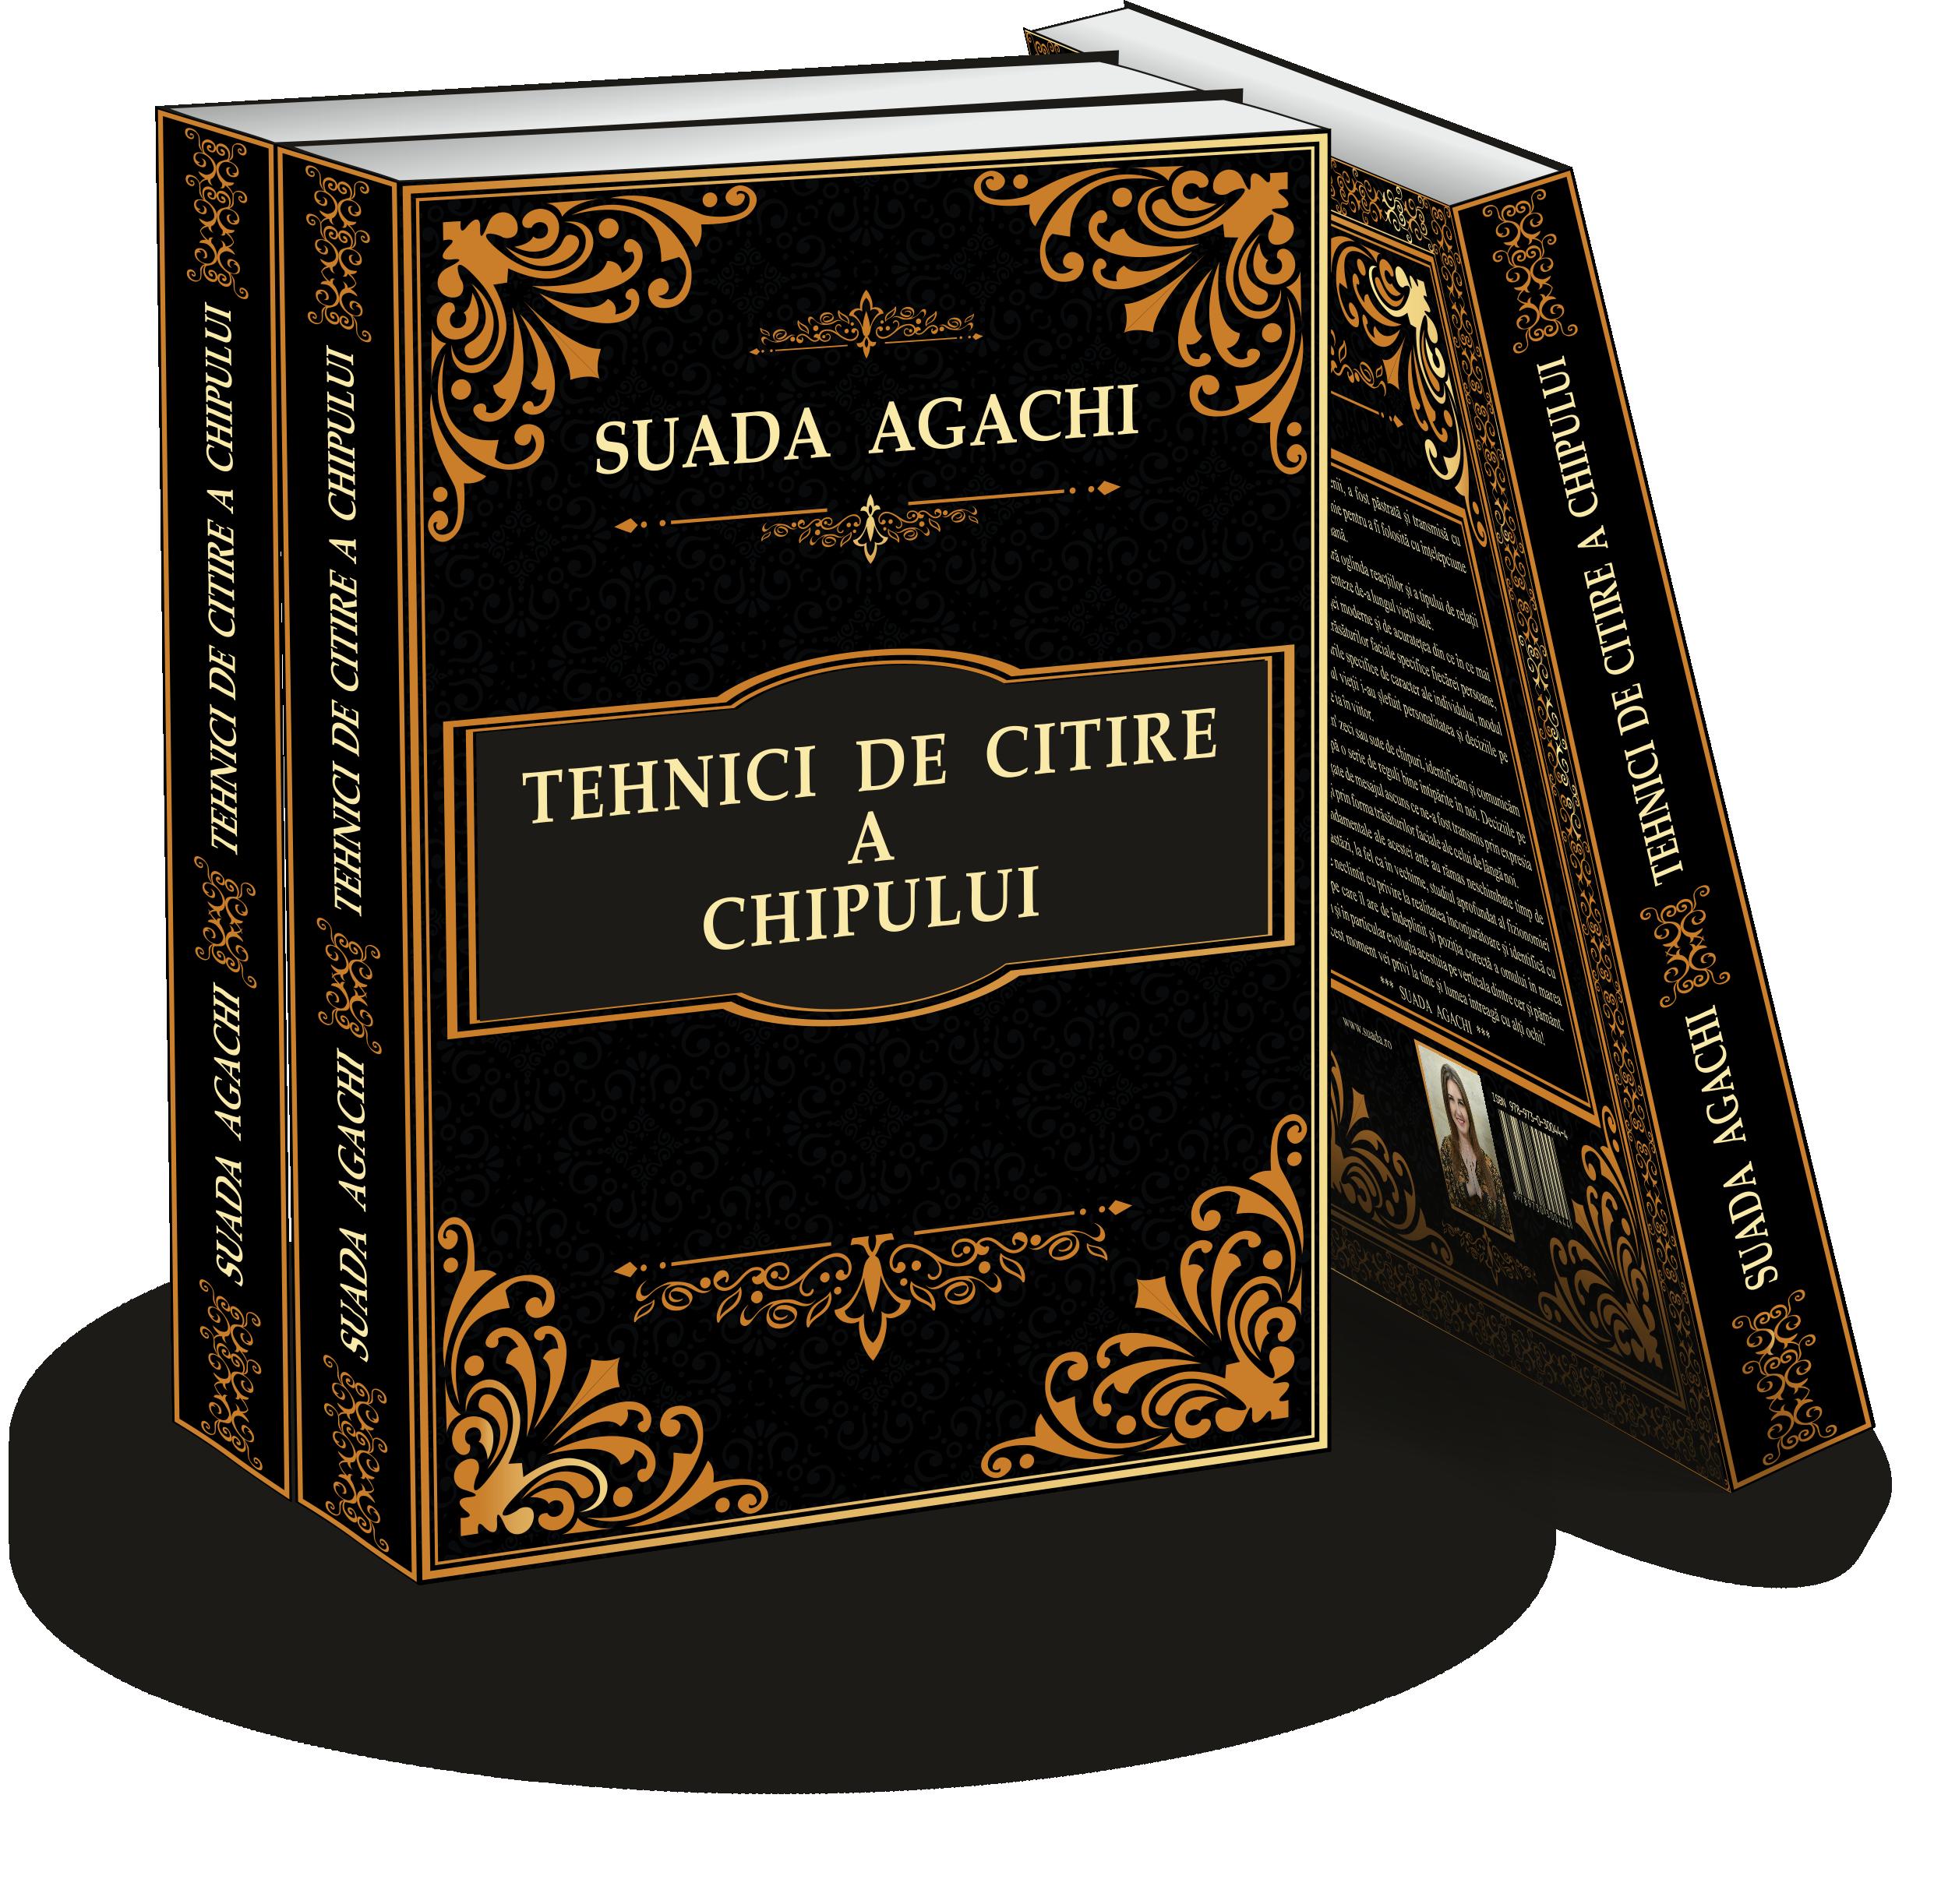 http://carticusens.ro/produs/tehnici-de-citire-a-chipului-suada-agachi/